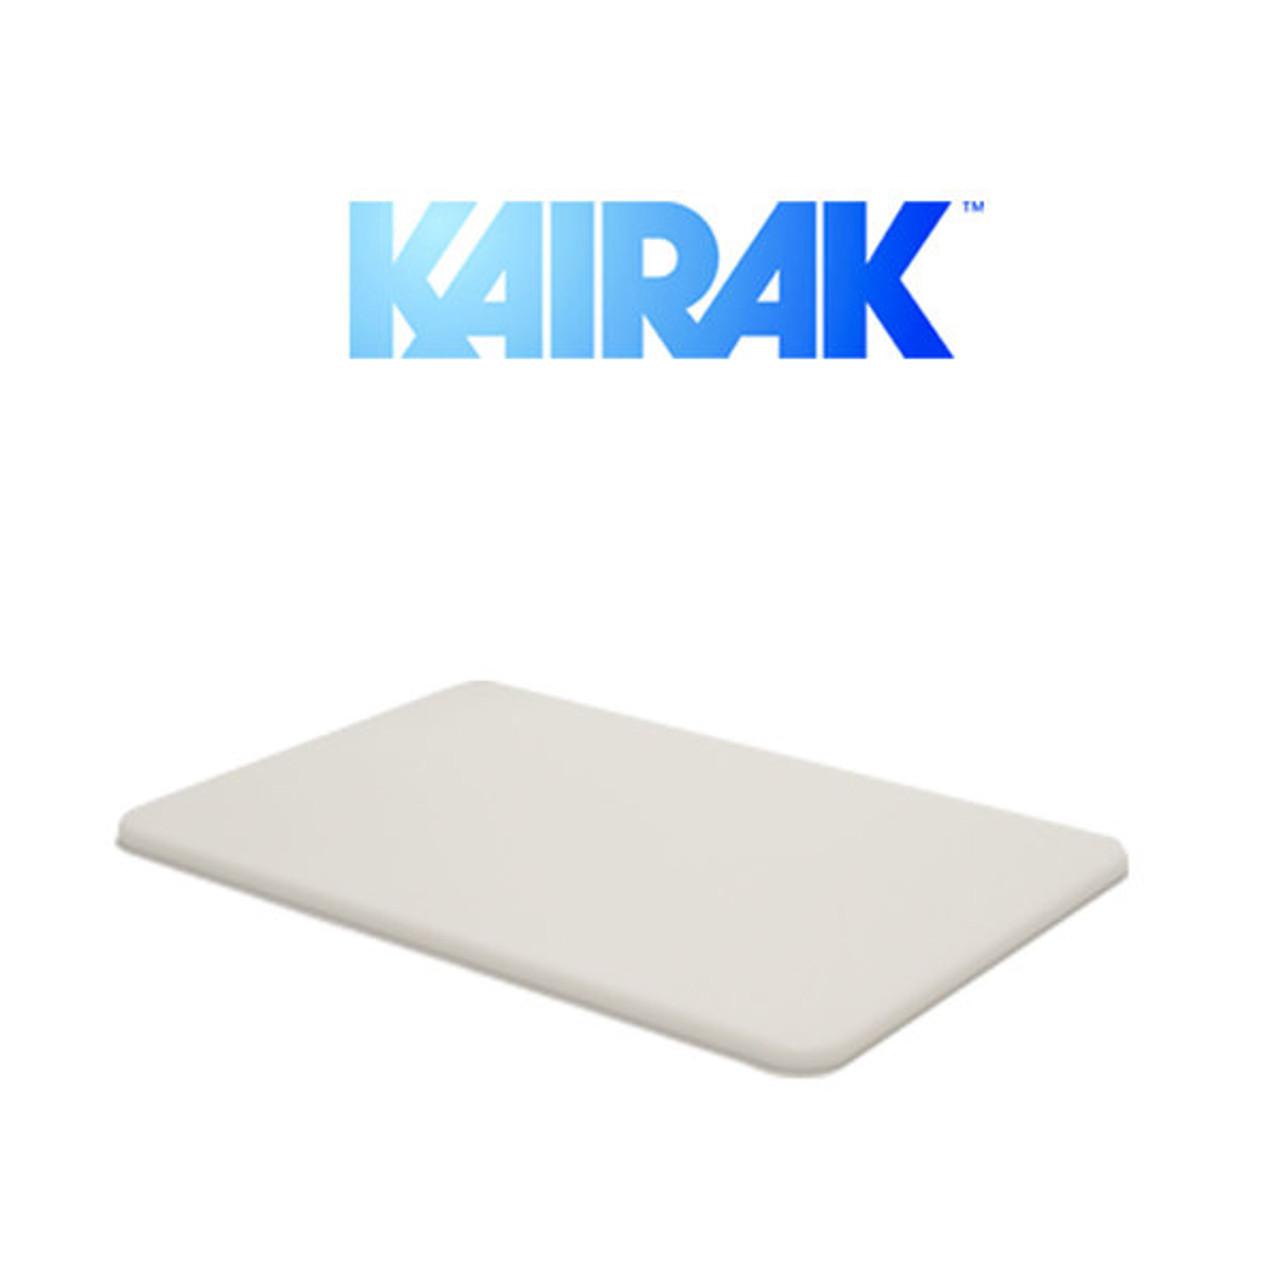 OEM Cutting Board - Kairak - P#: 12125